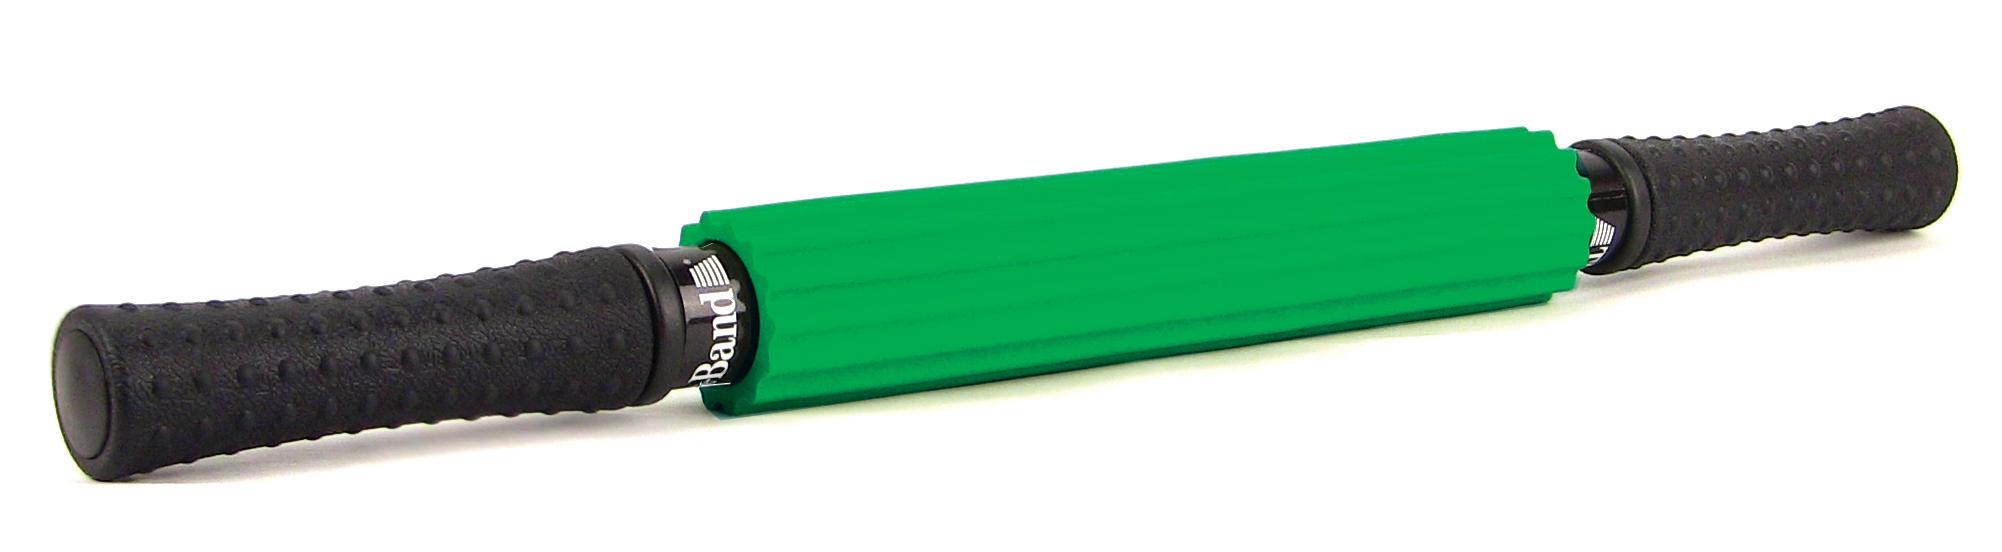 rolo de massagem verde